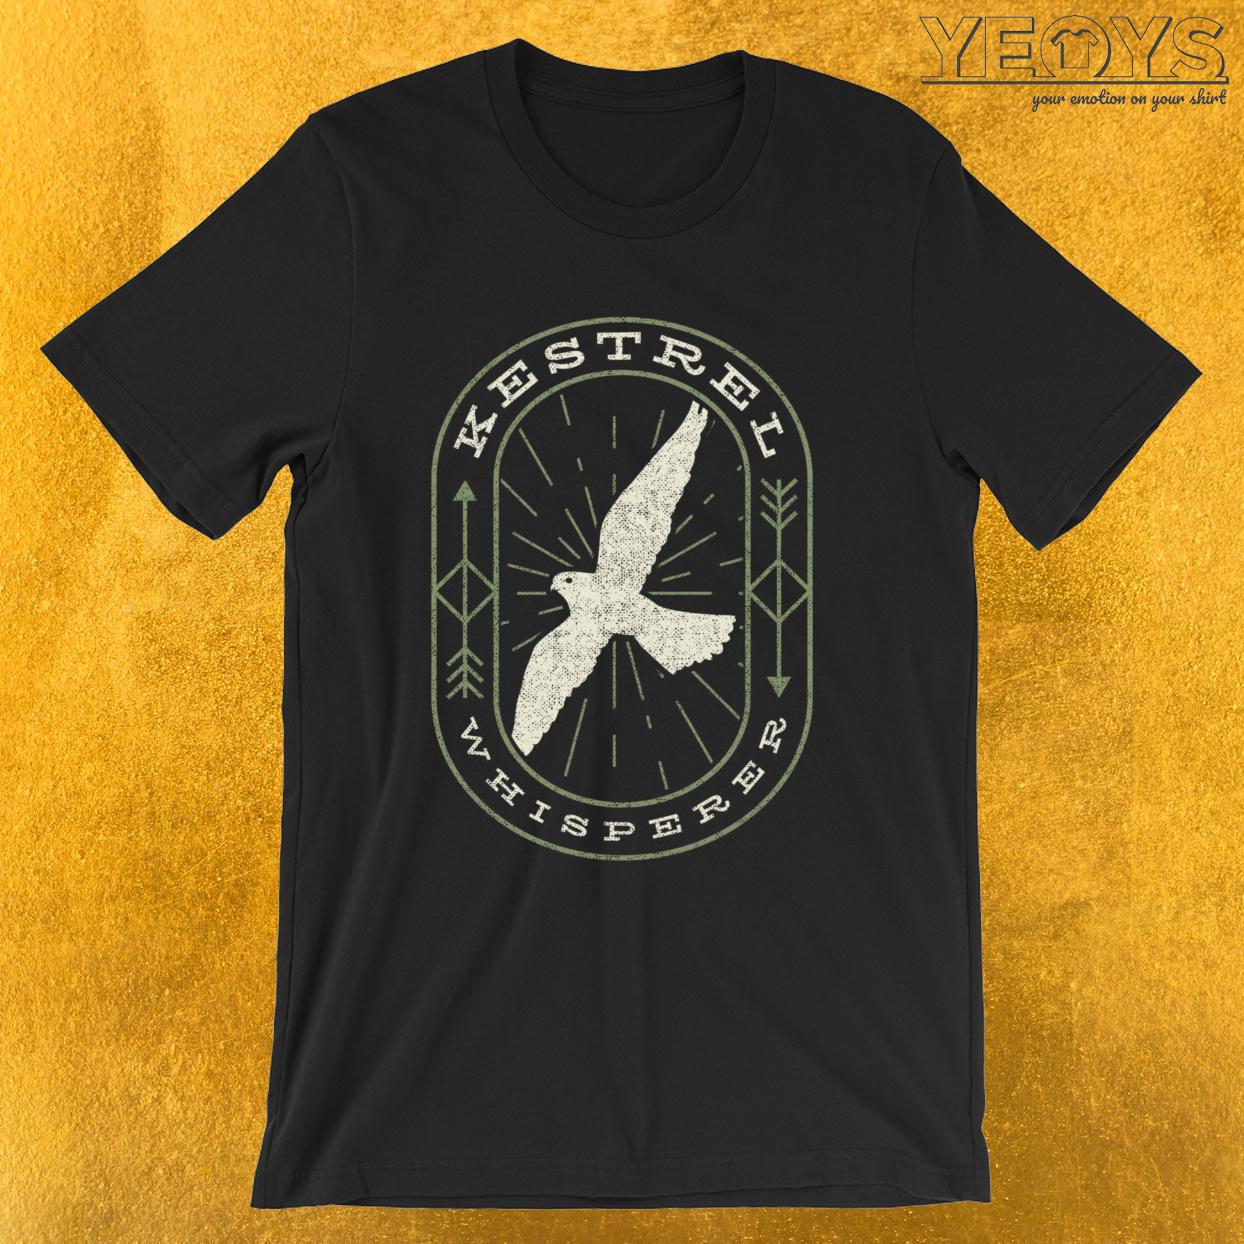 Kestrel Whisperer – Funny Birding Tee